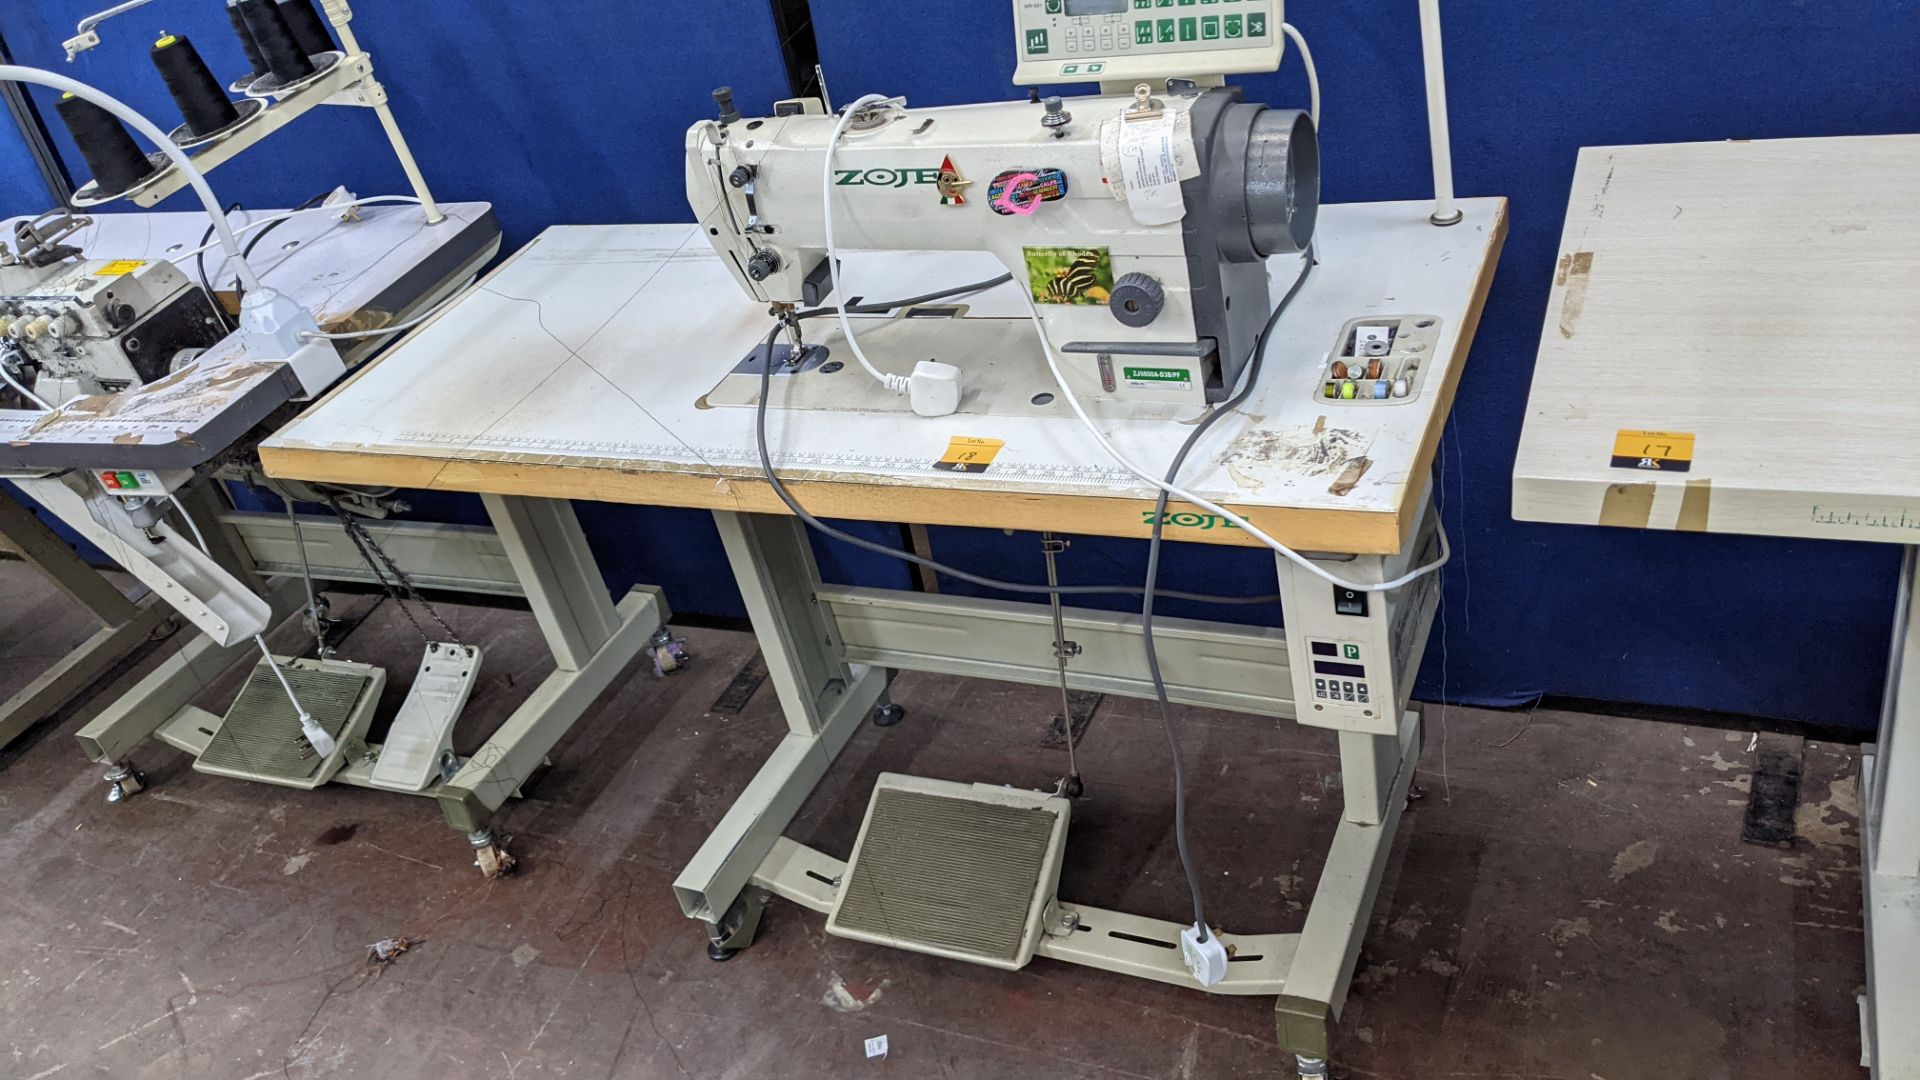 Zoje model ZJ9800A-D3B/PF lockstitch sewing machine with model WR-501 digital controller - Image 2 of 20